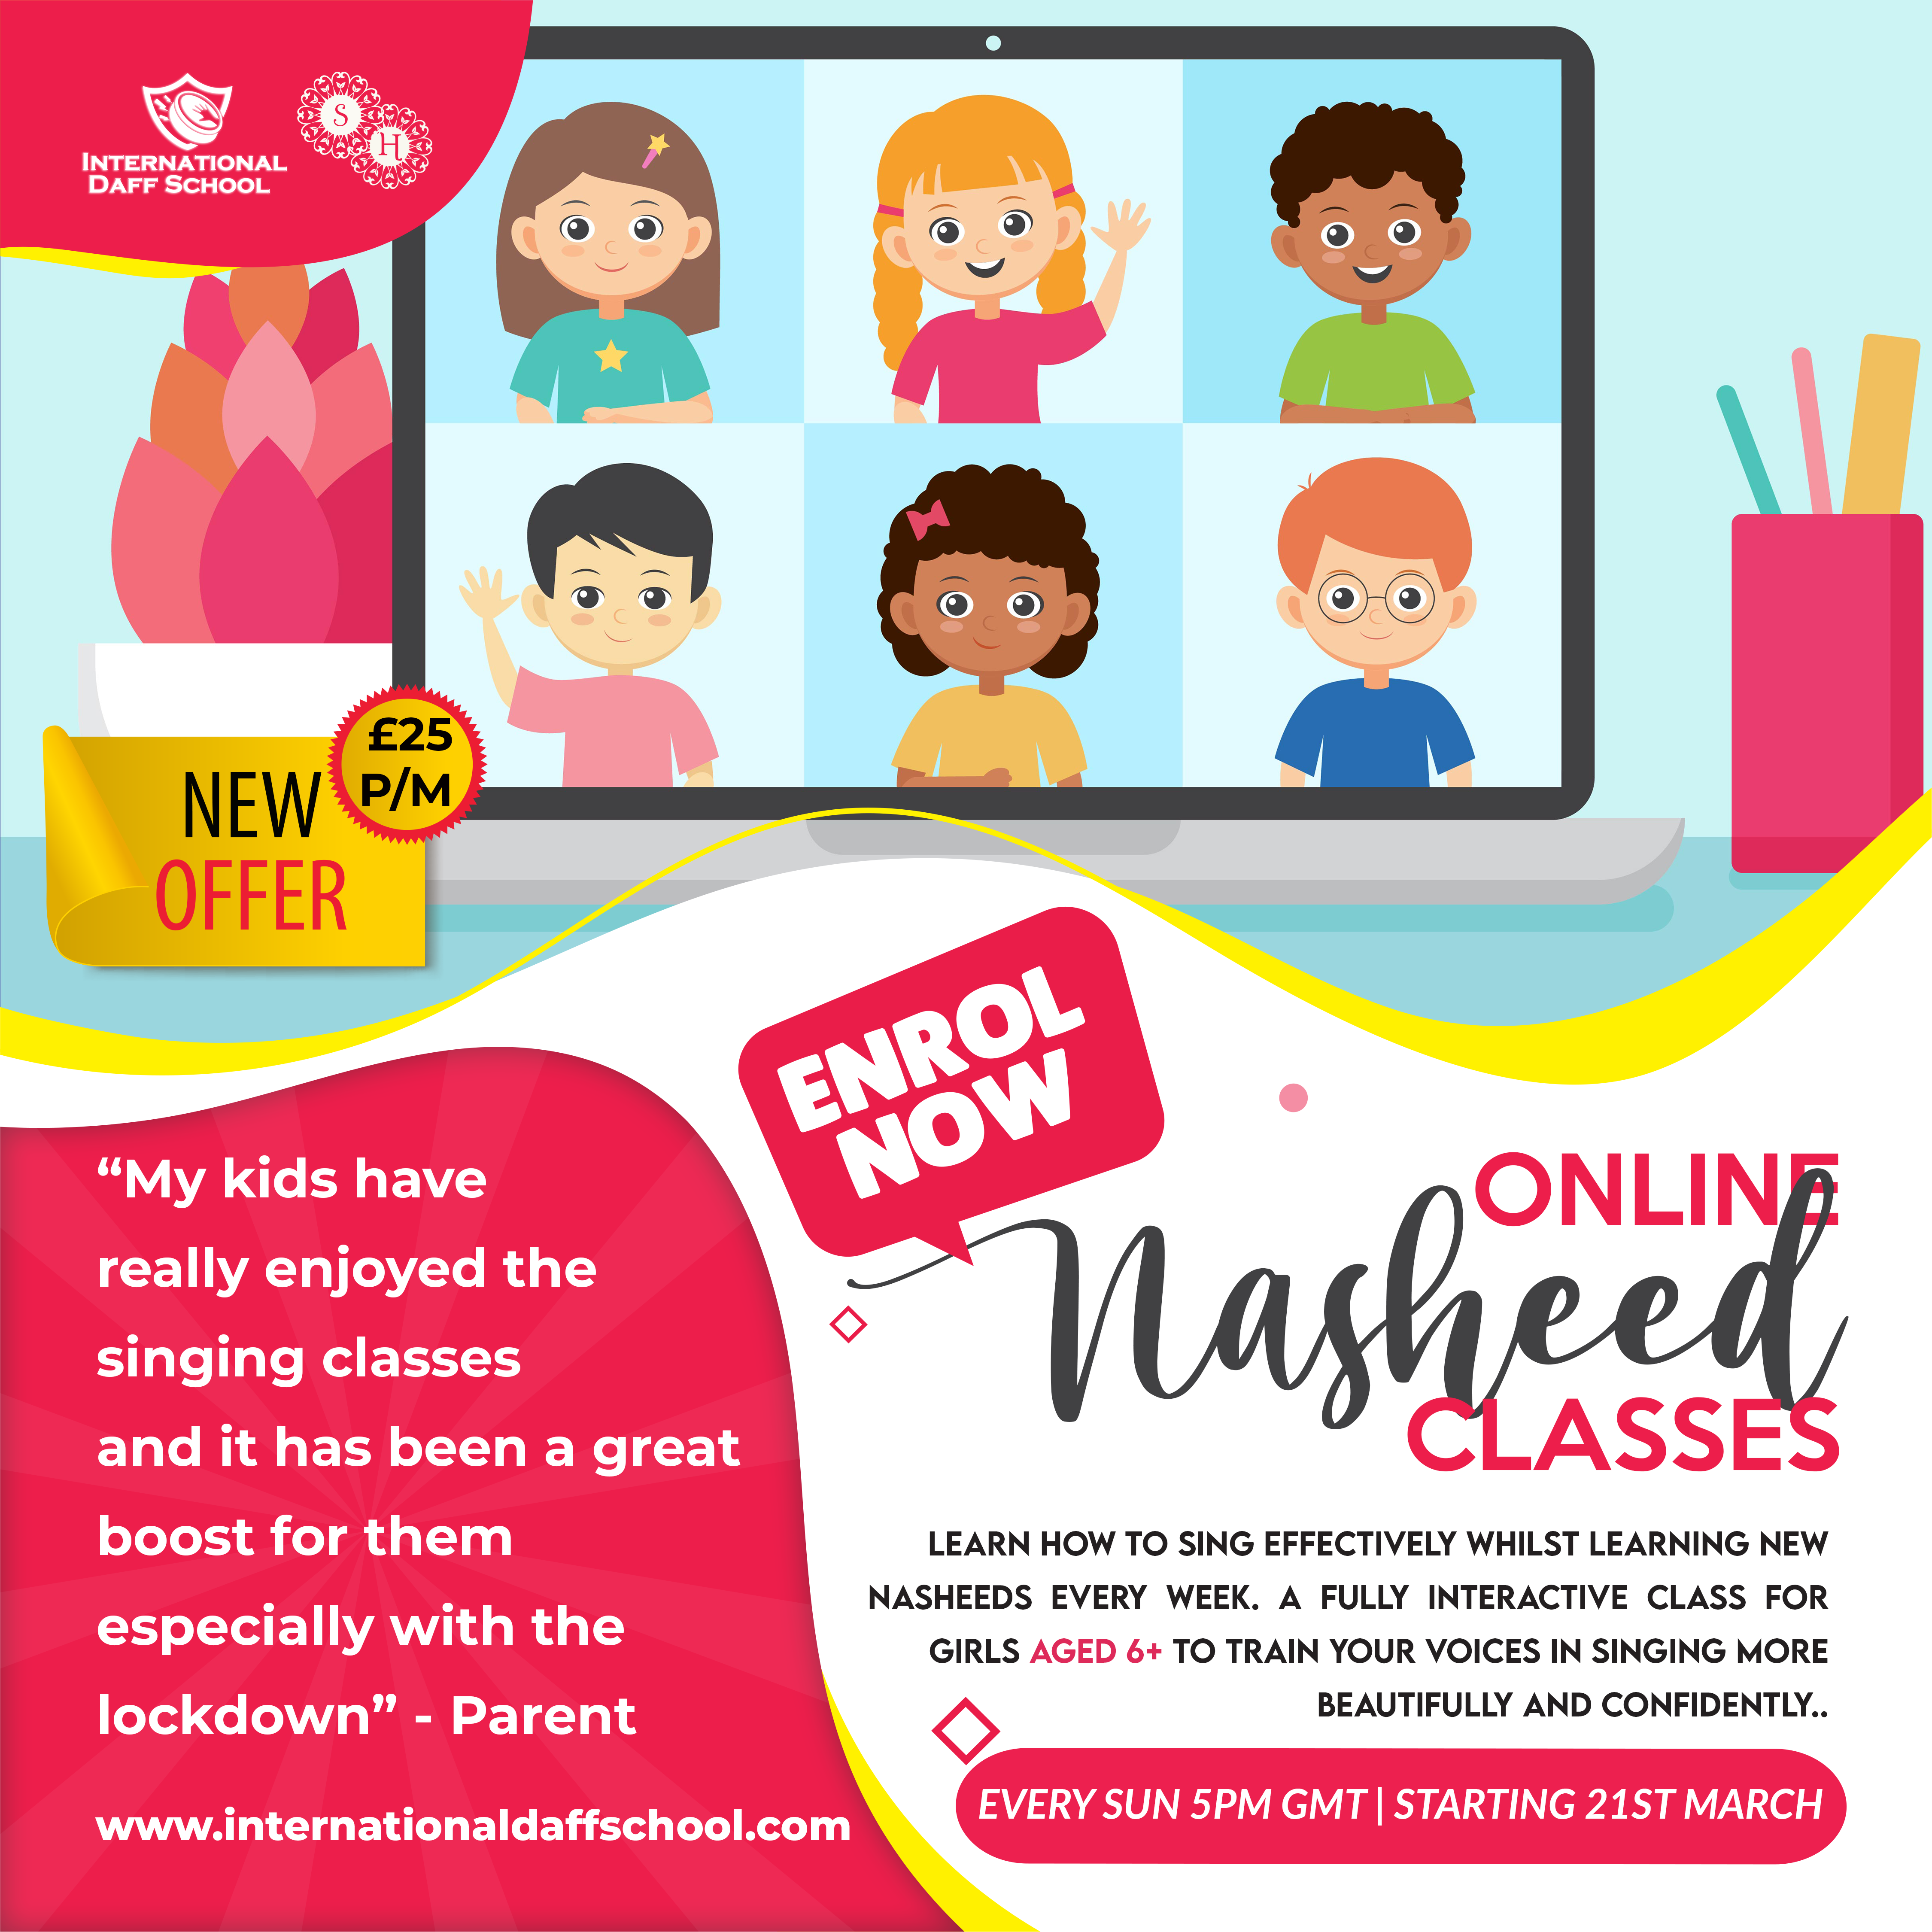 Children's Nasheed Classes